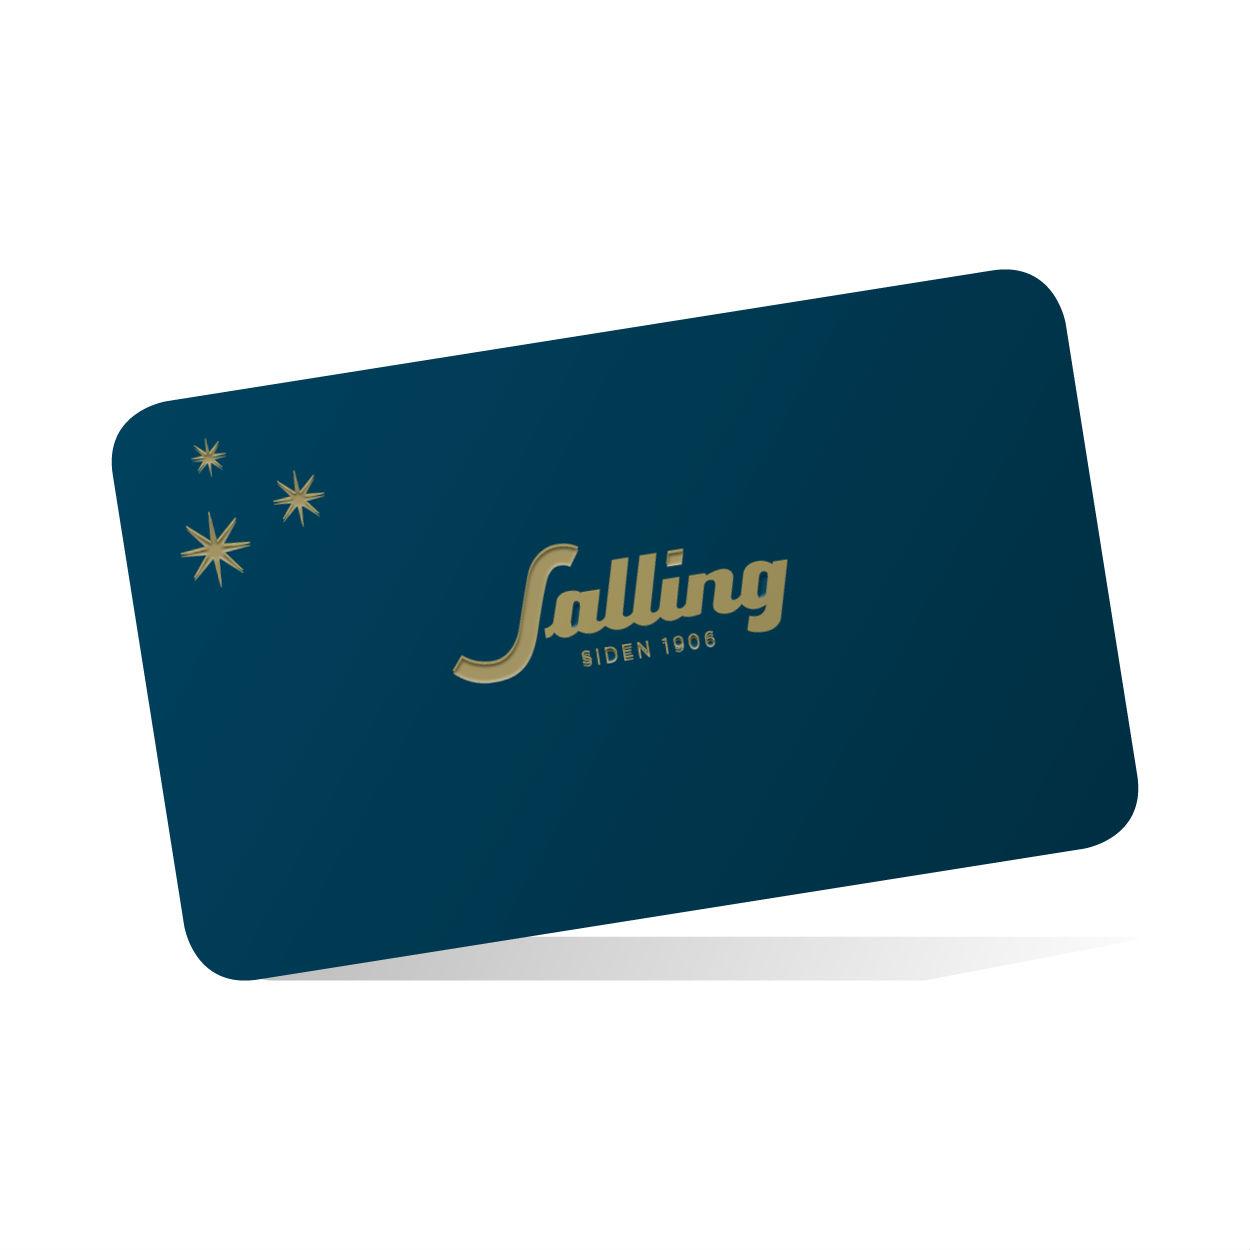 Salling gavekort - 1200 kr